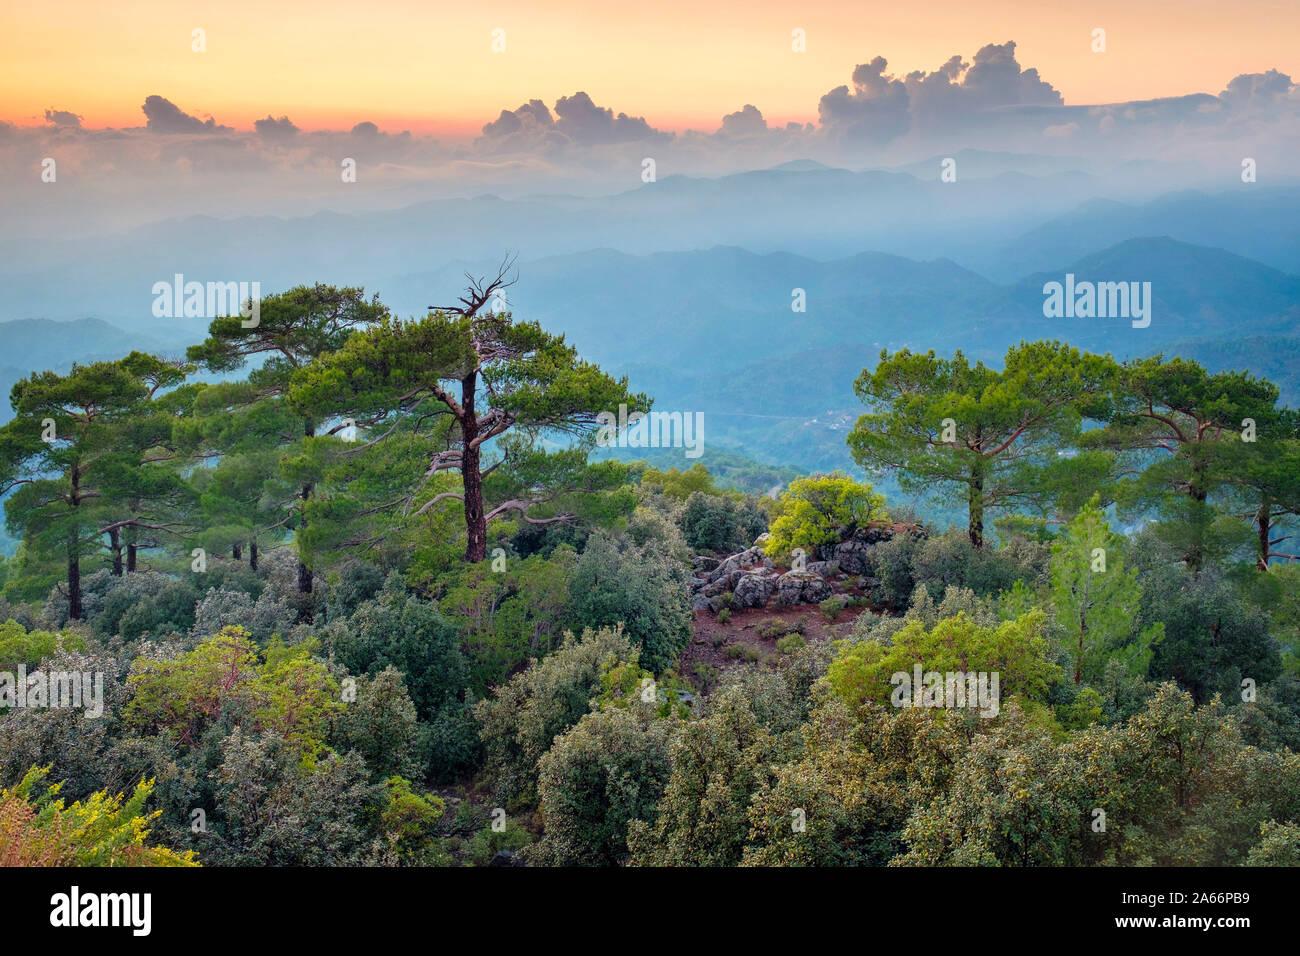 Troödos montañas paisaje al atardecer, Pano platres, distrito de Limassol, Chipre Foto de stock